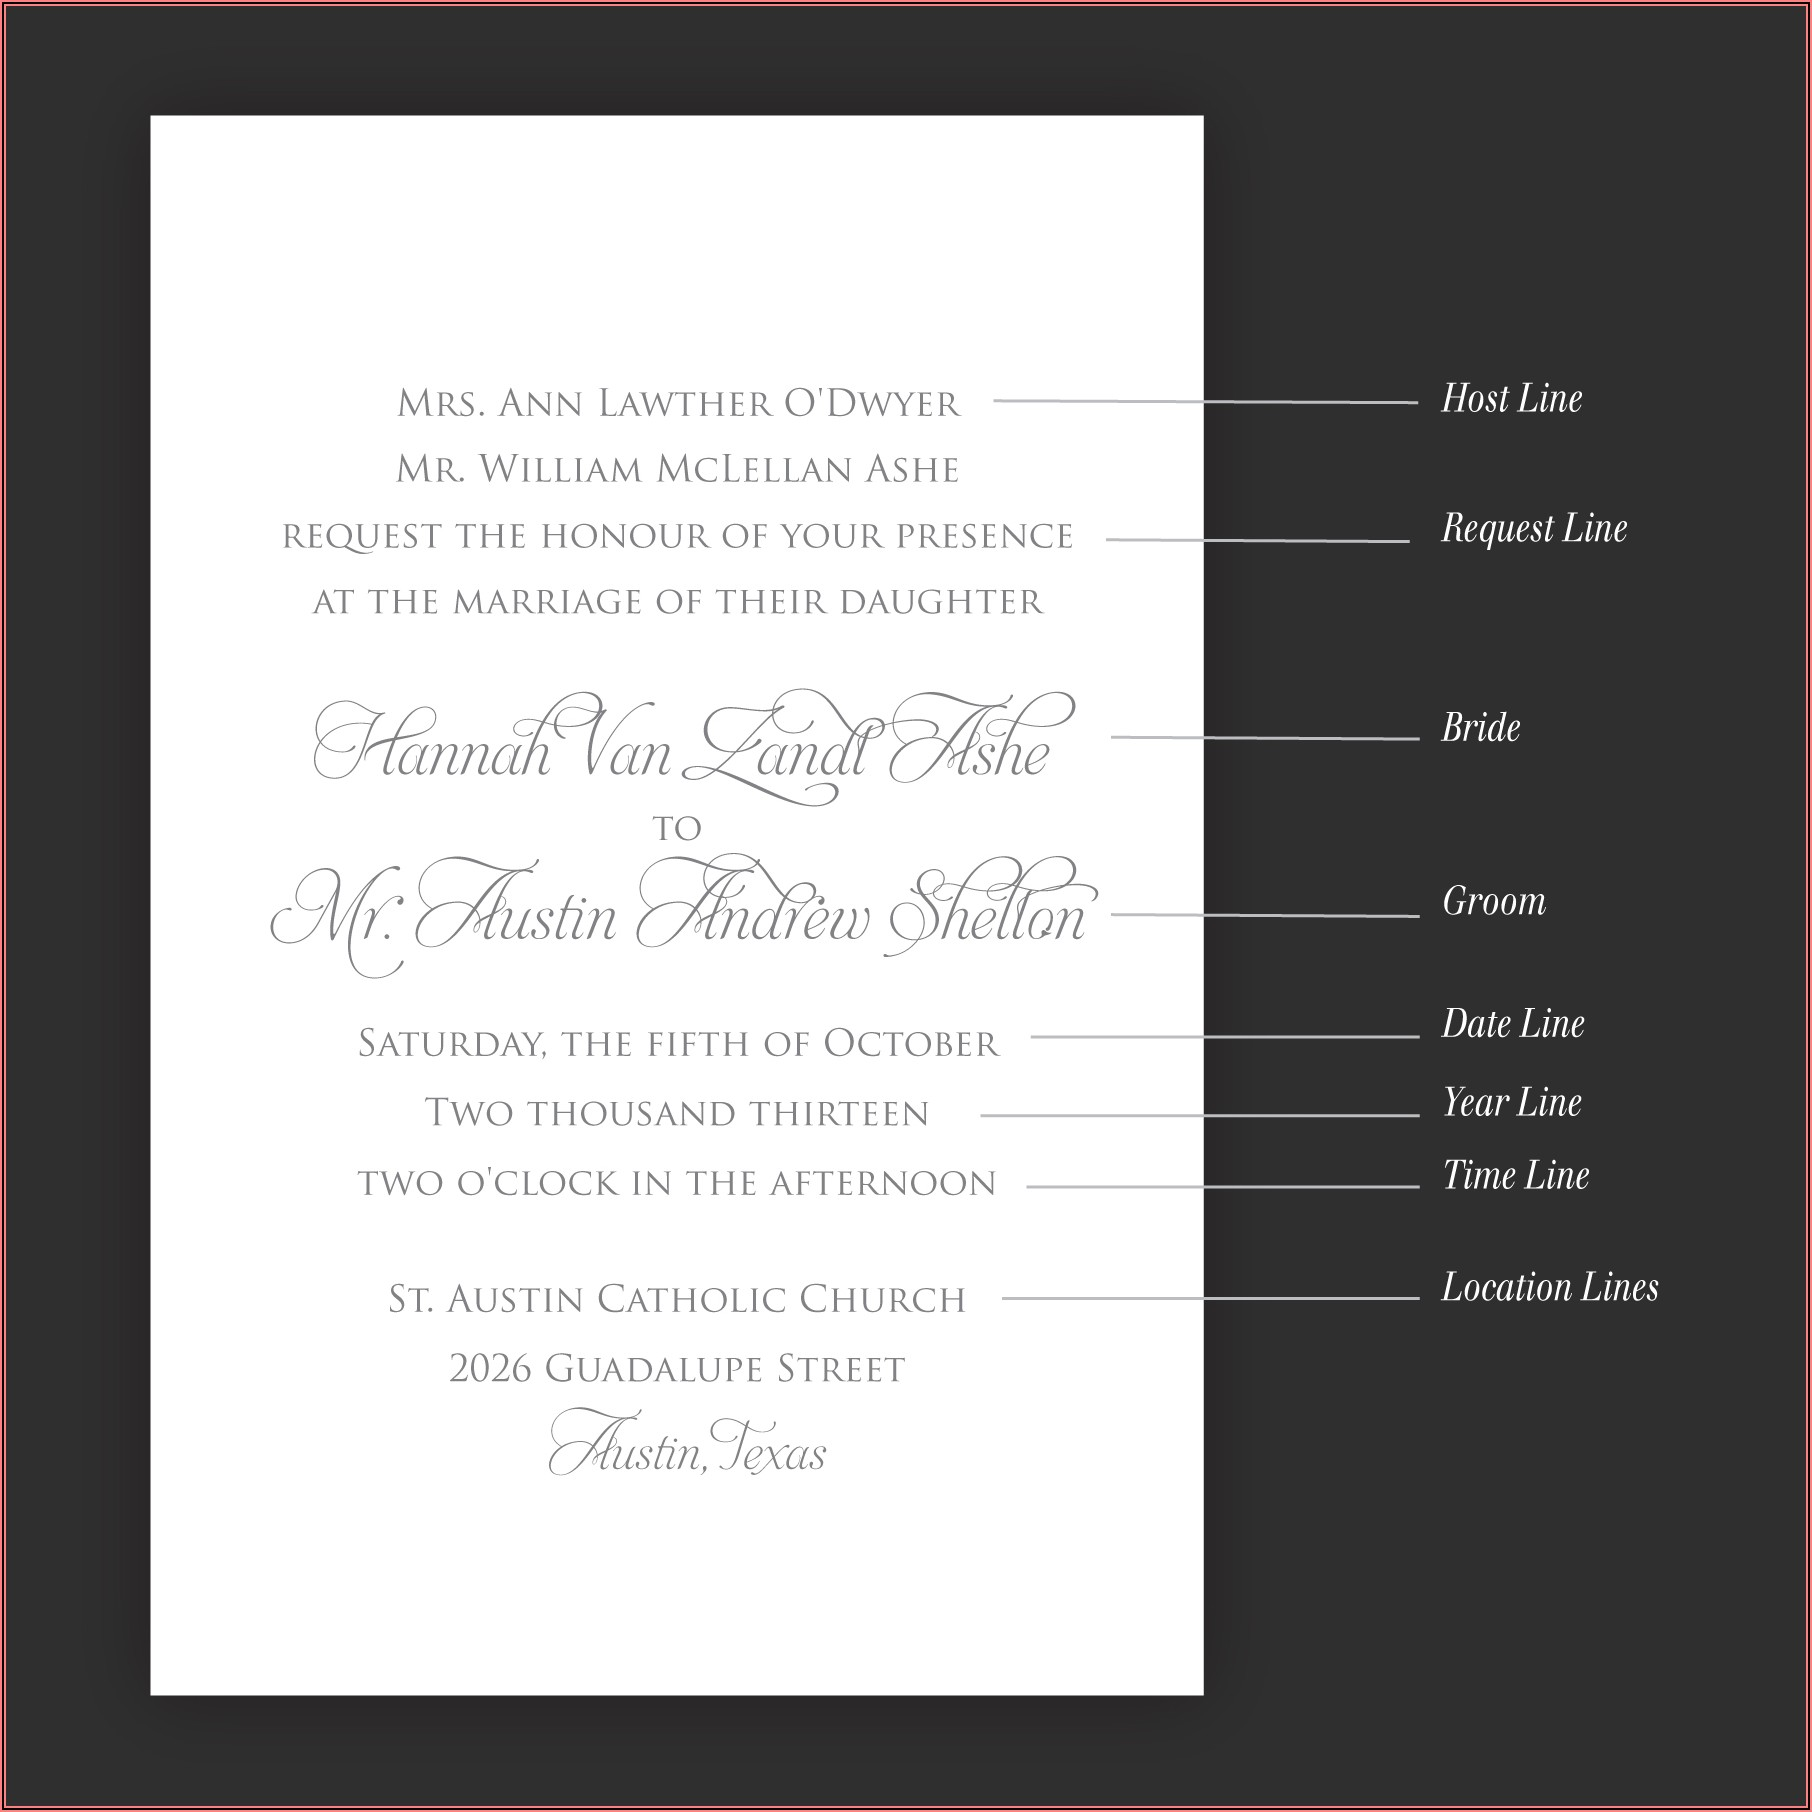 Wedding Invitation Wording Etiquette Bride's Parents Hosting